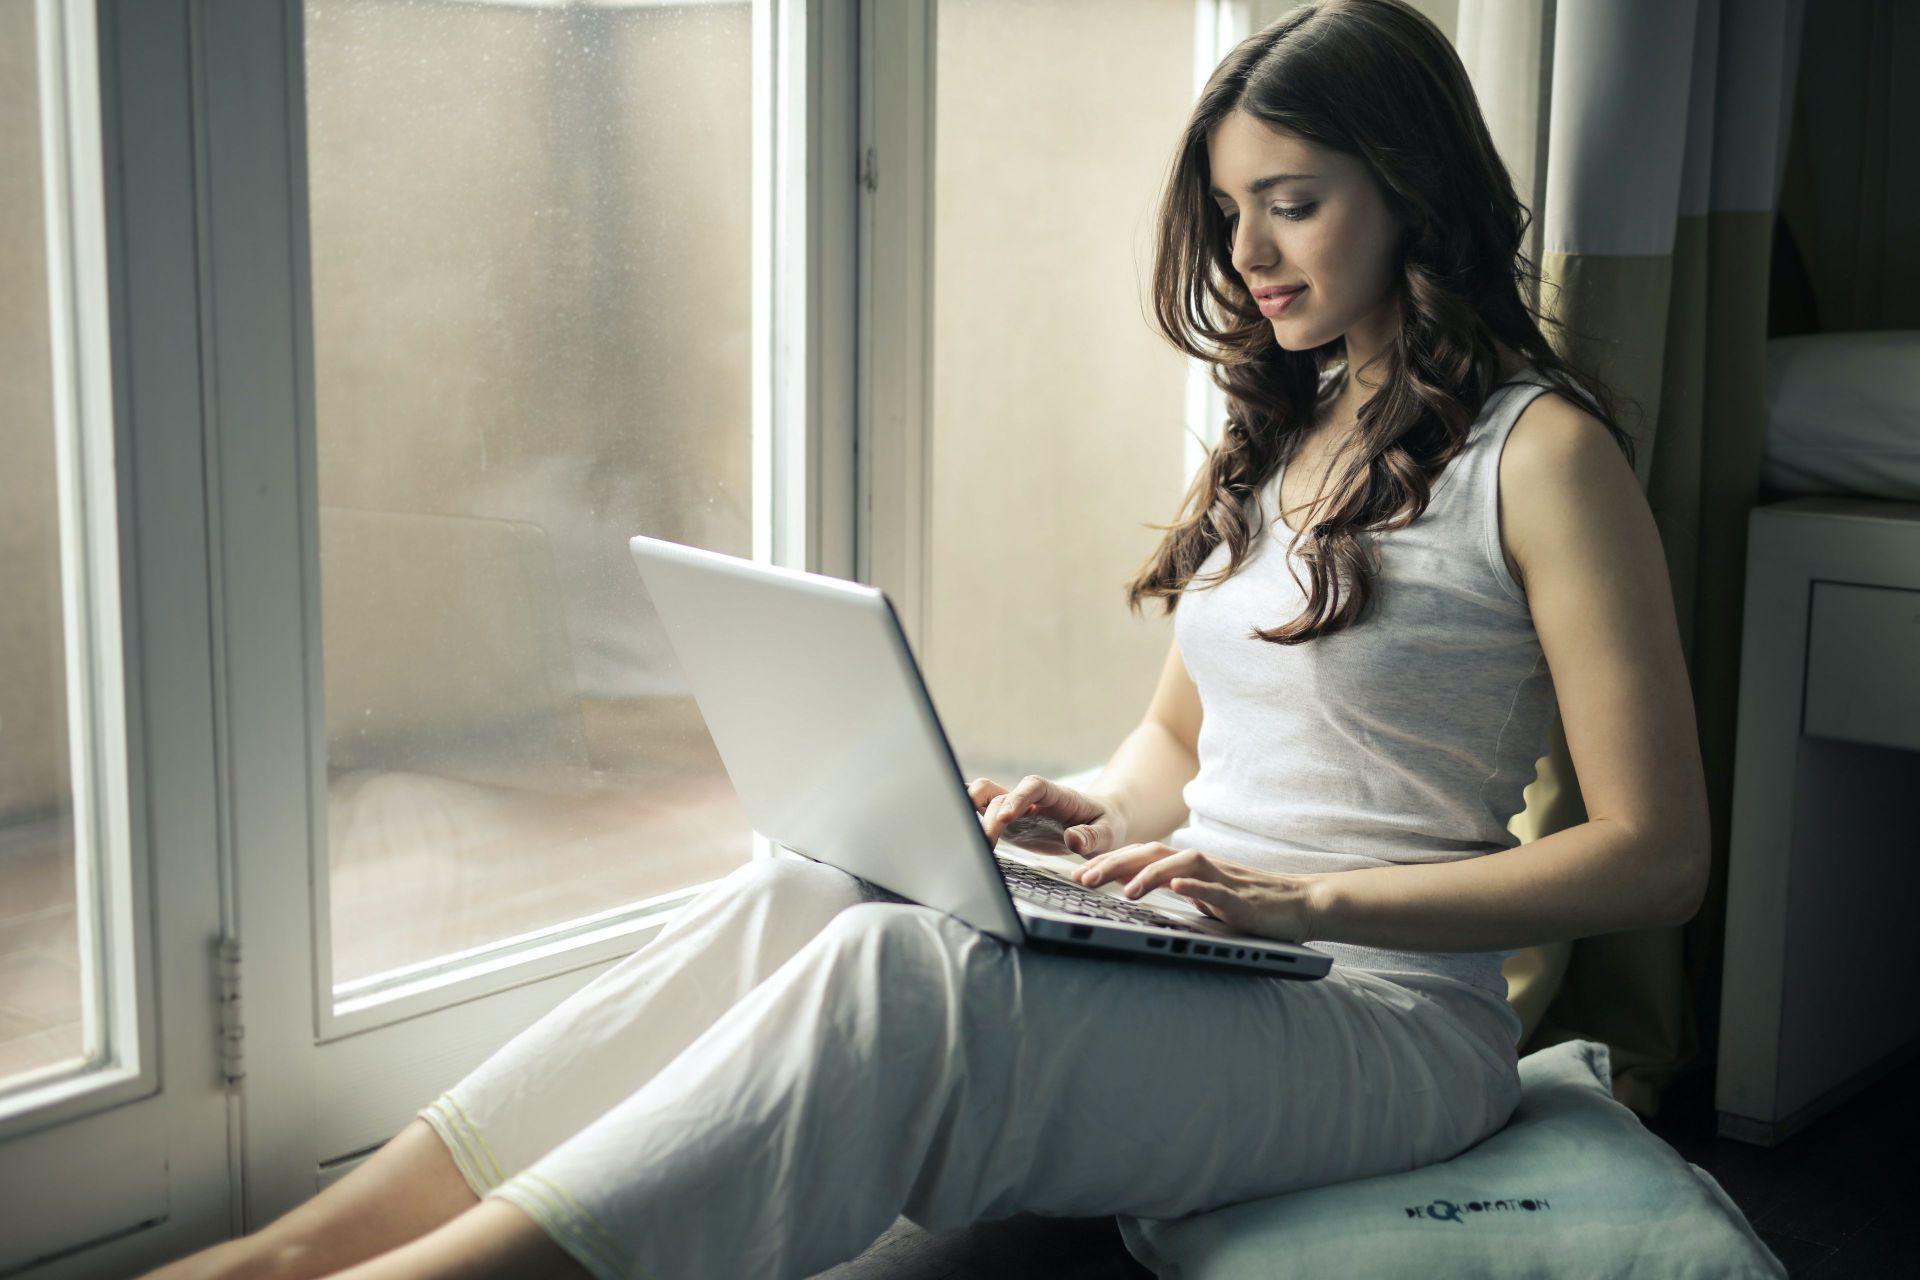 Migliori-Notebook-2021-Windows-10-macOS-e-Chrome-OS Il miglior notebook Windows per fotografi e videografi 2018